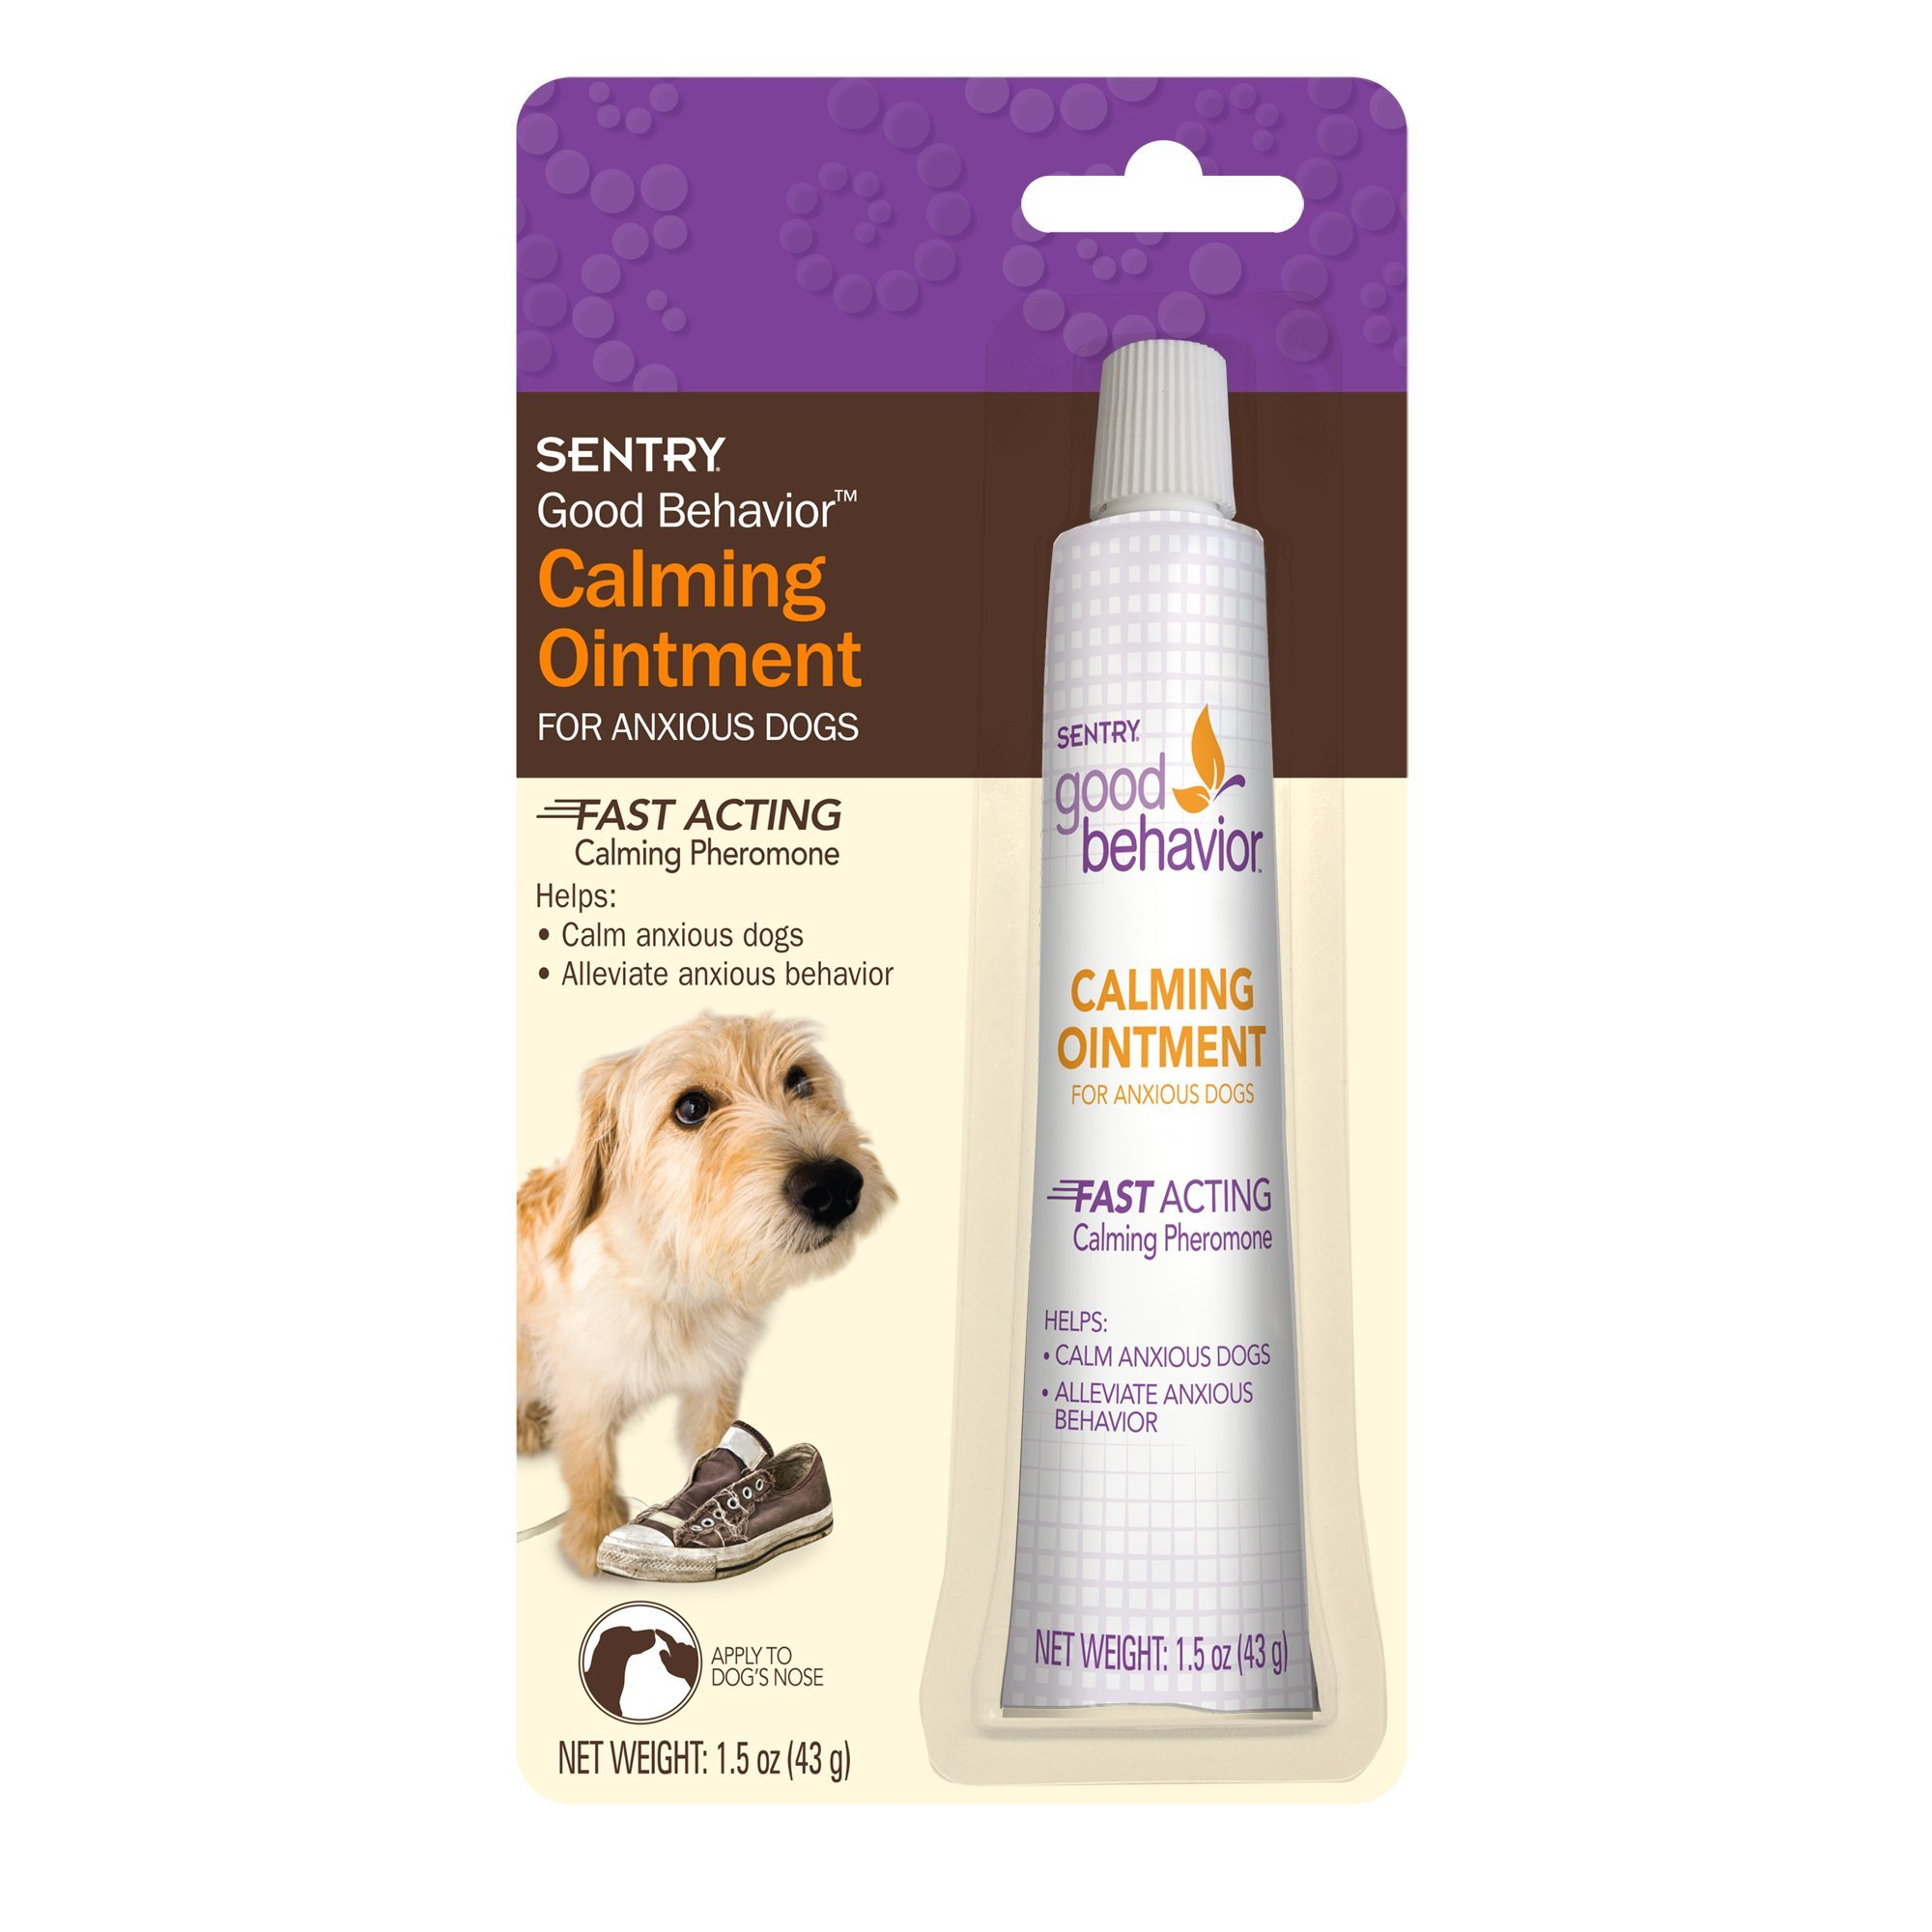 Good Behavior Sentry Calming Ointment Dog 1.5 oz. by Good Behavior